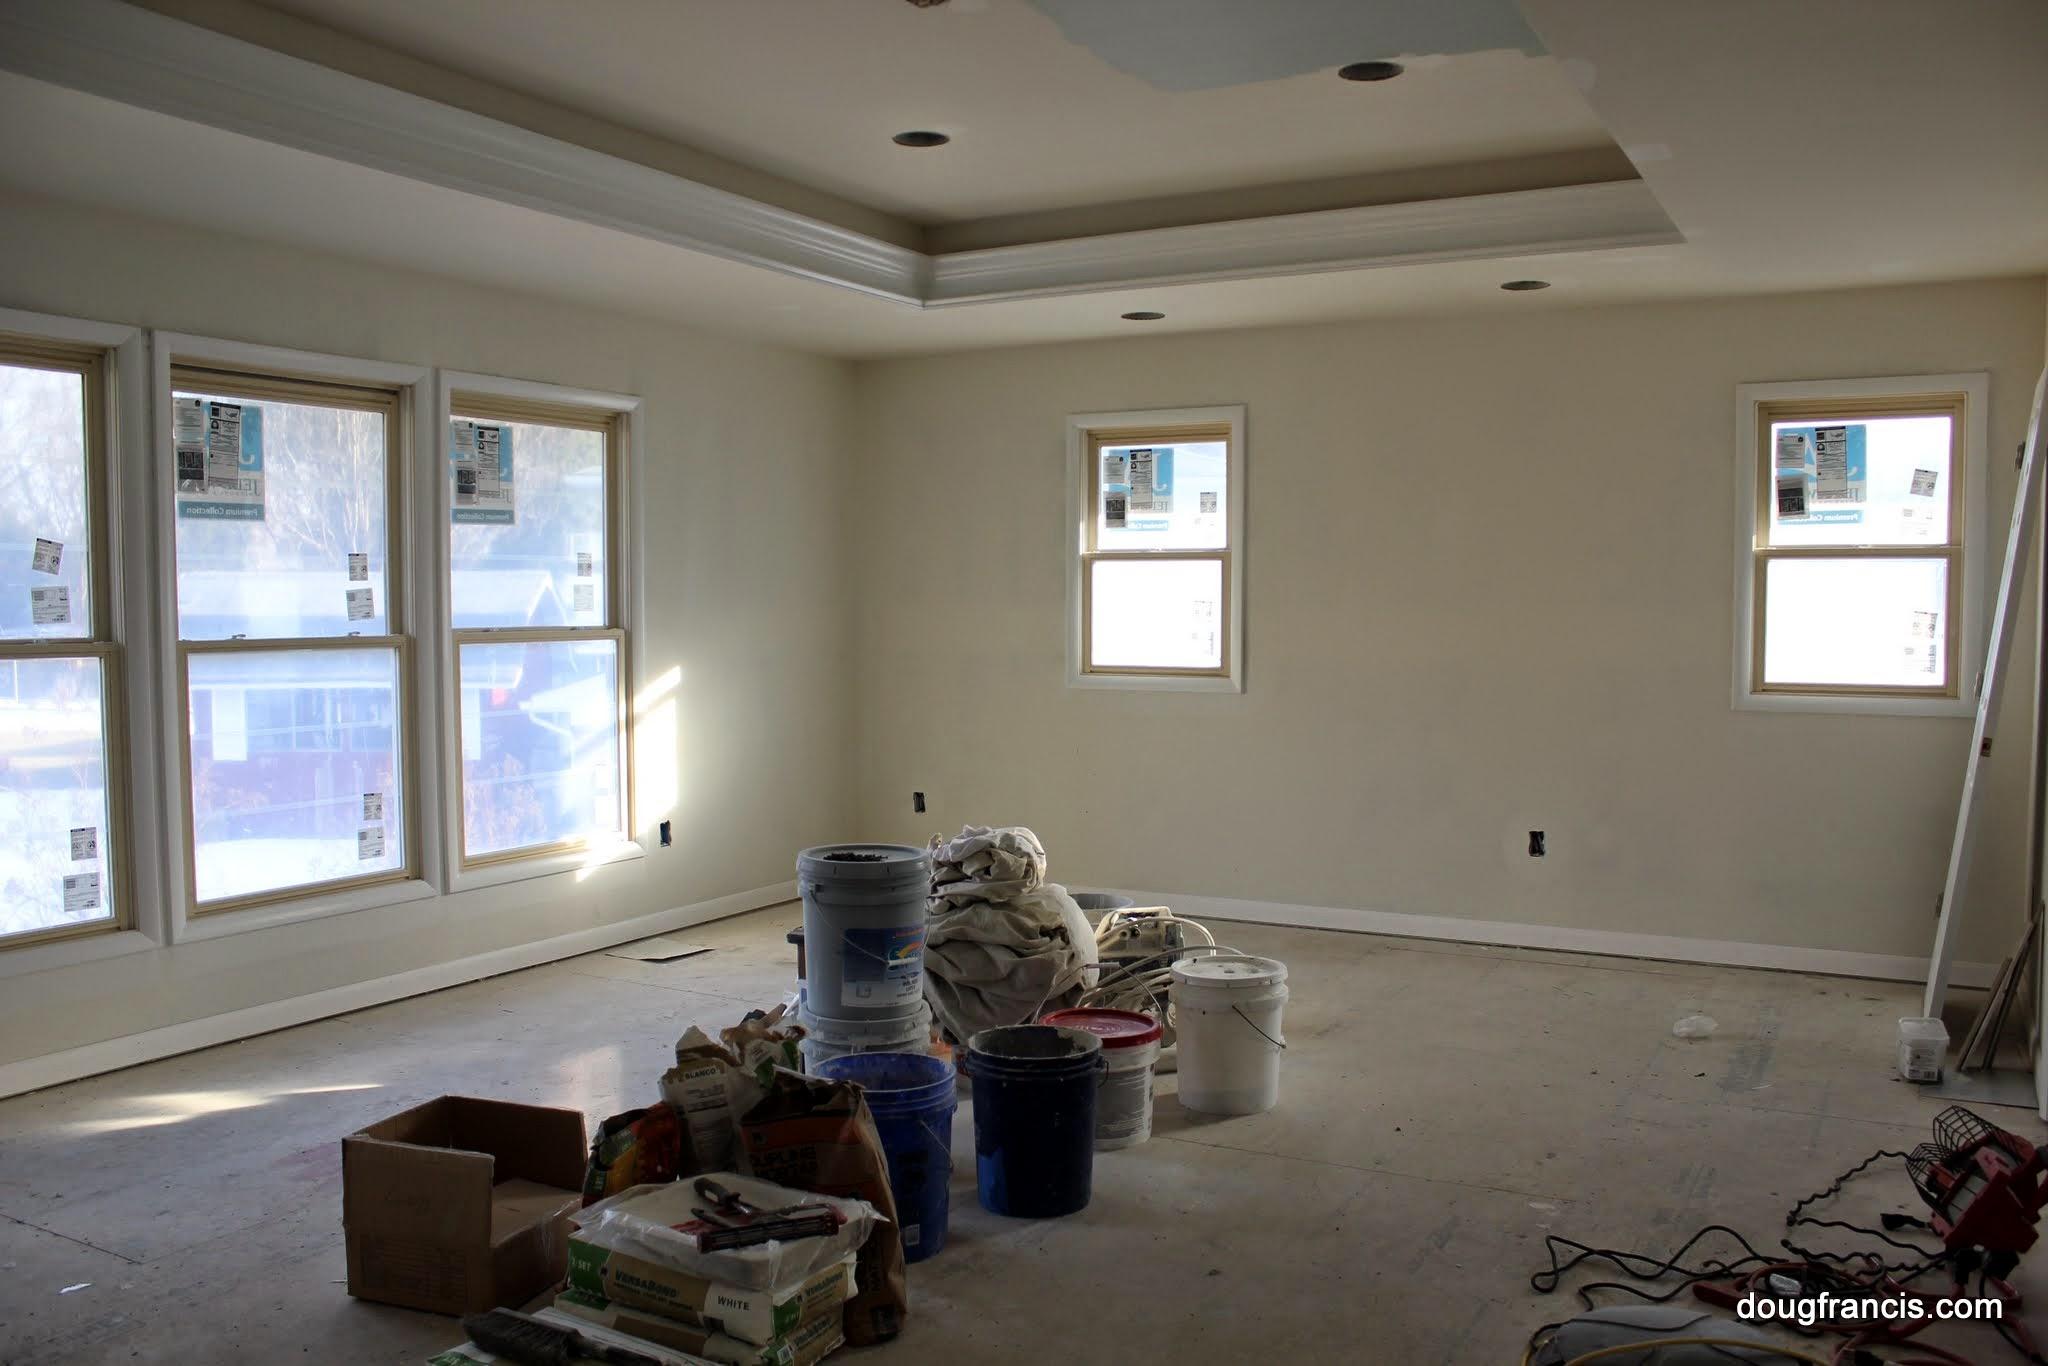 New Bedroom Addition Over Garage. U201c